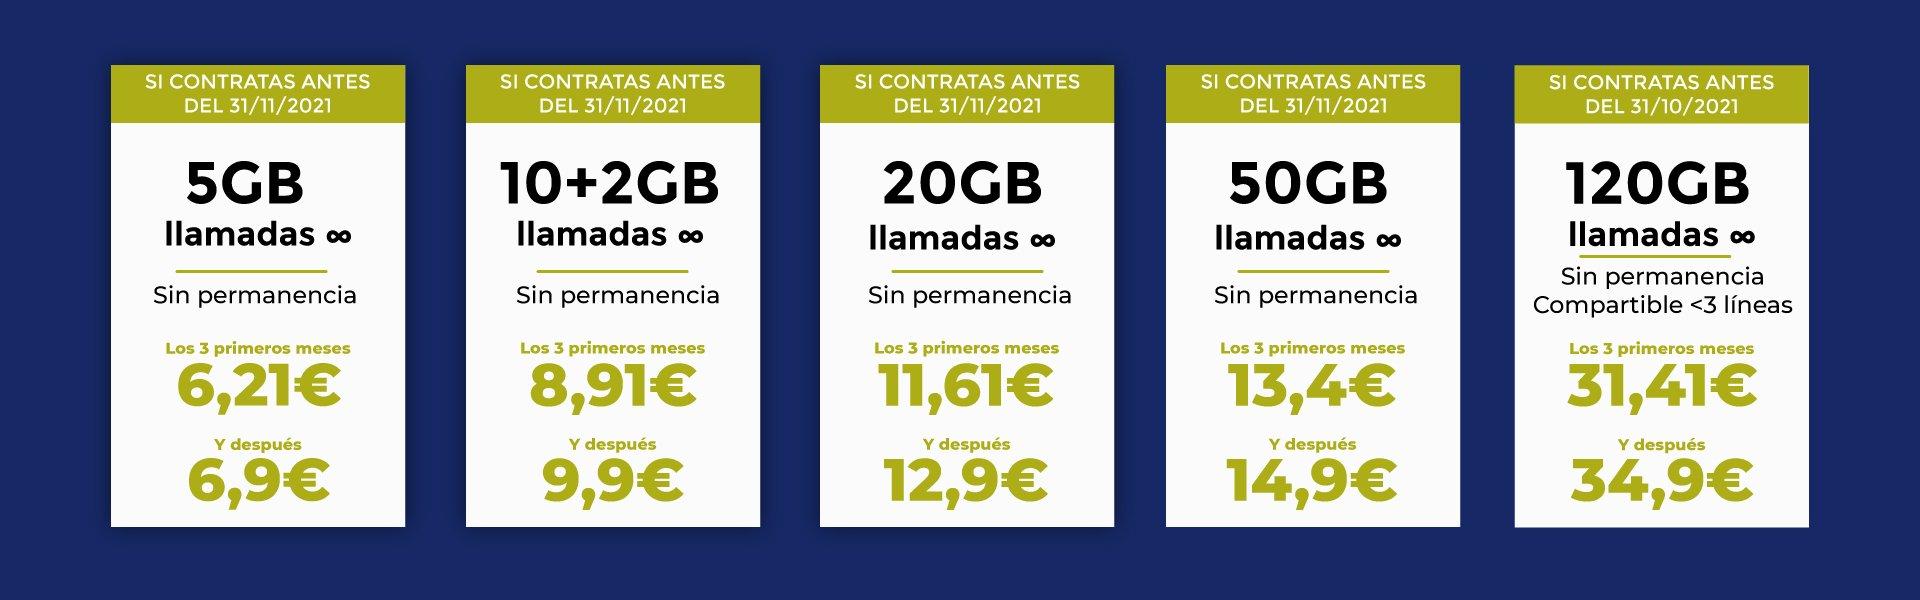 tarifas móviles de Mobilfree de septiembre de 2021